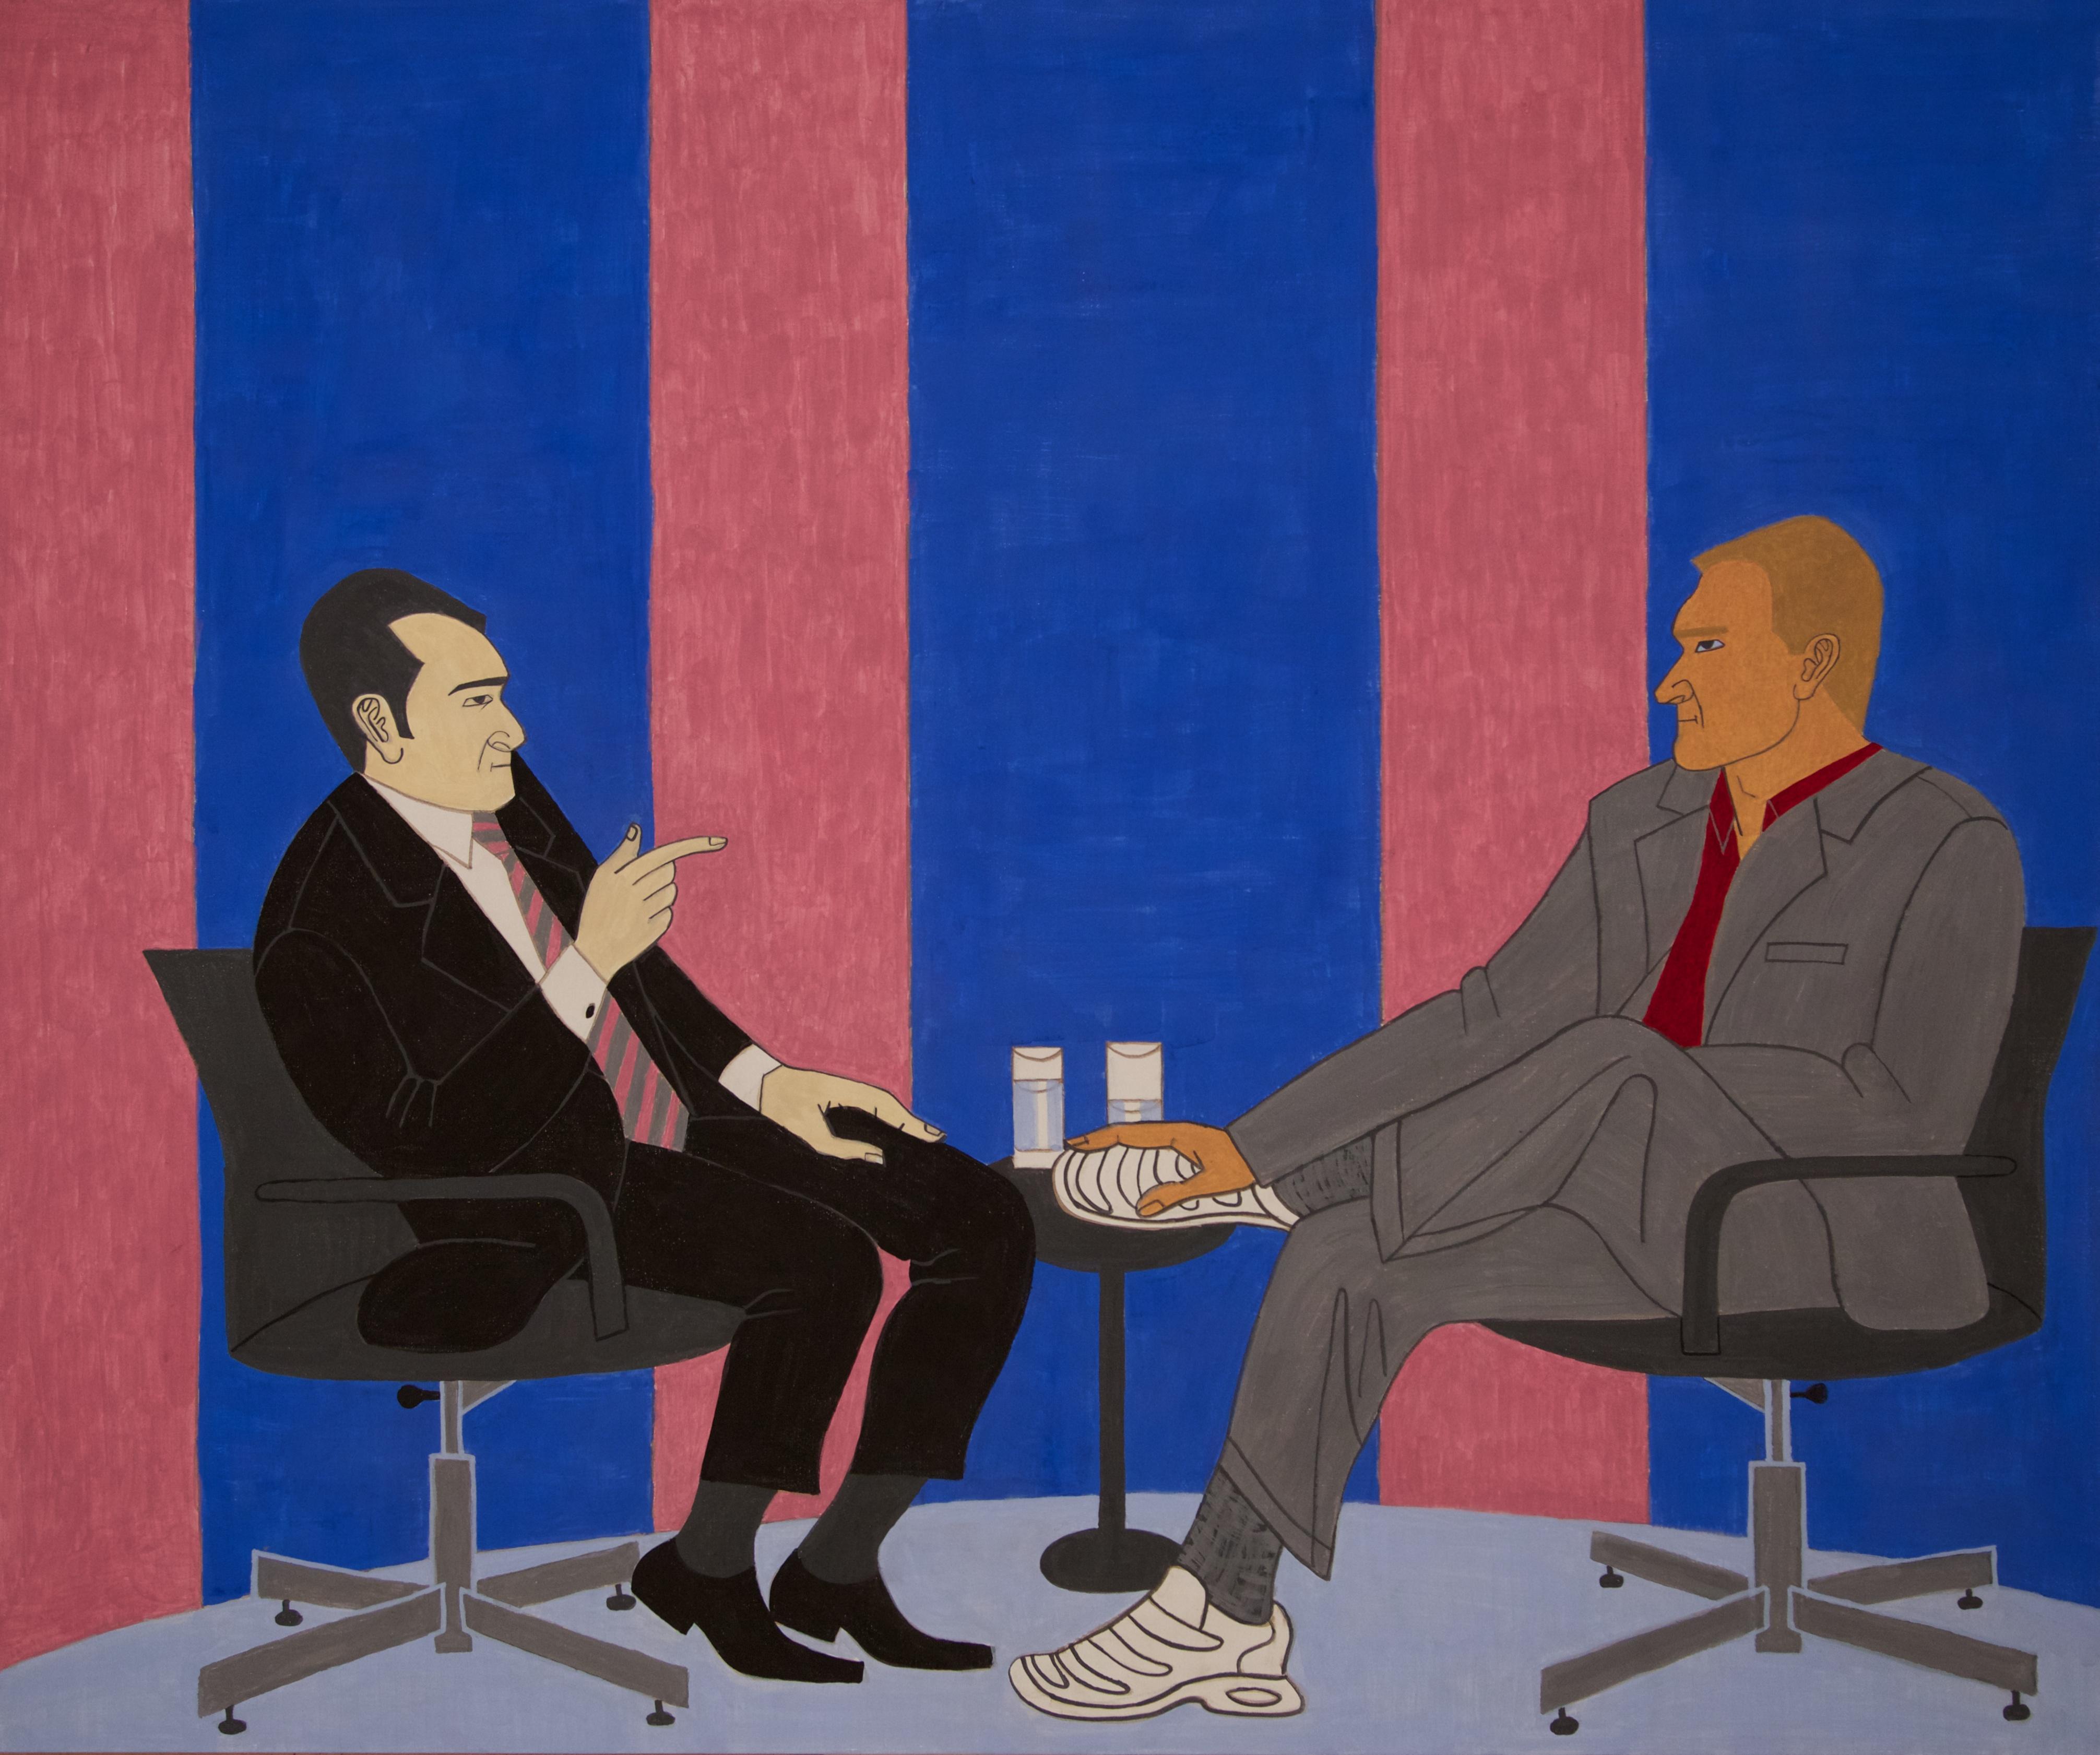 Talk Show, 2015, casein on aluminum, 30 x 36 inches - courtesy the artist